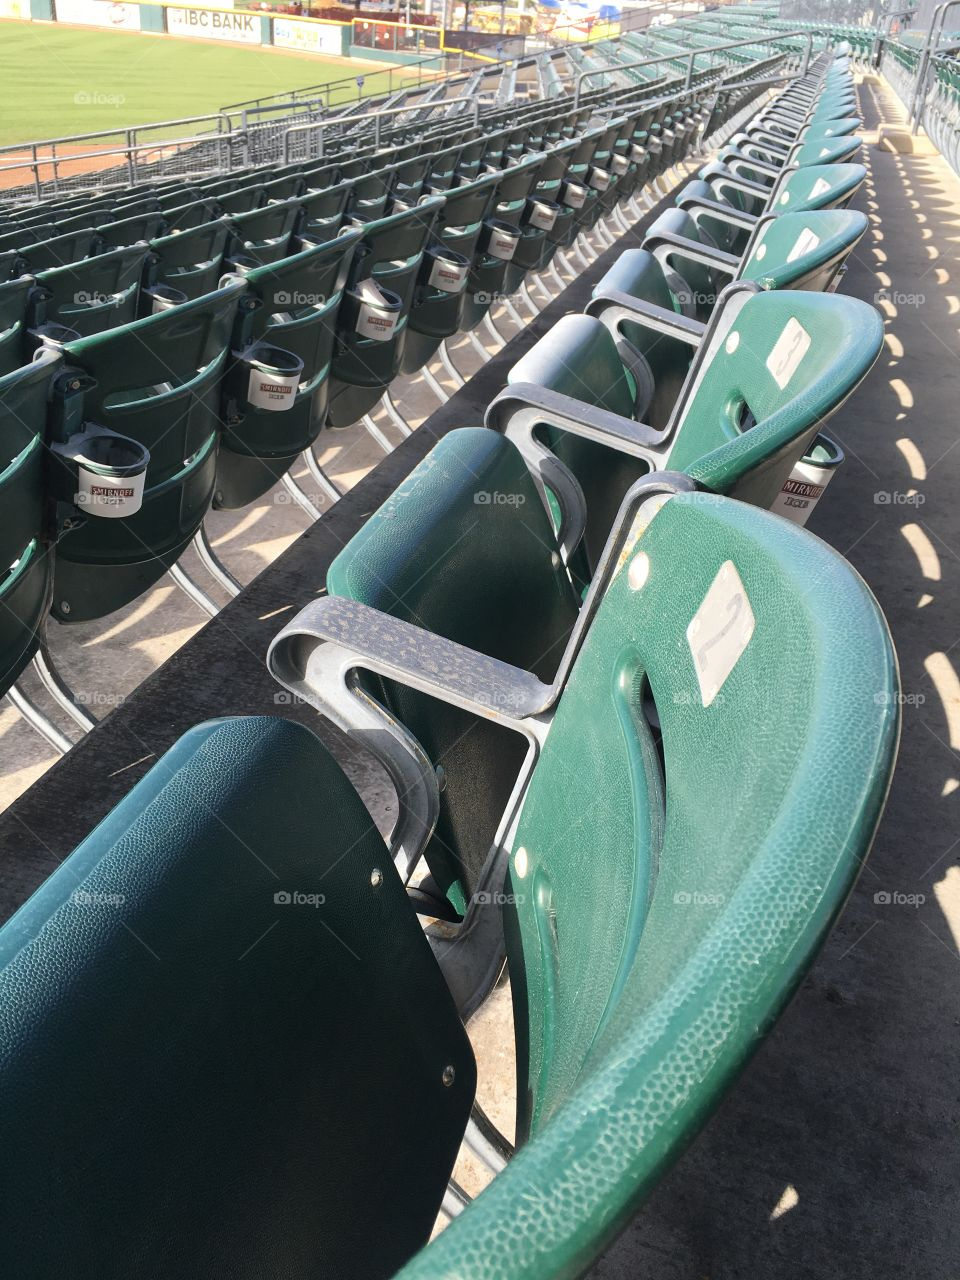 Stadium seats at a baseball park in Texas.